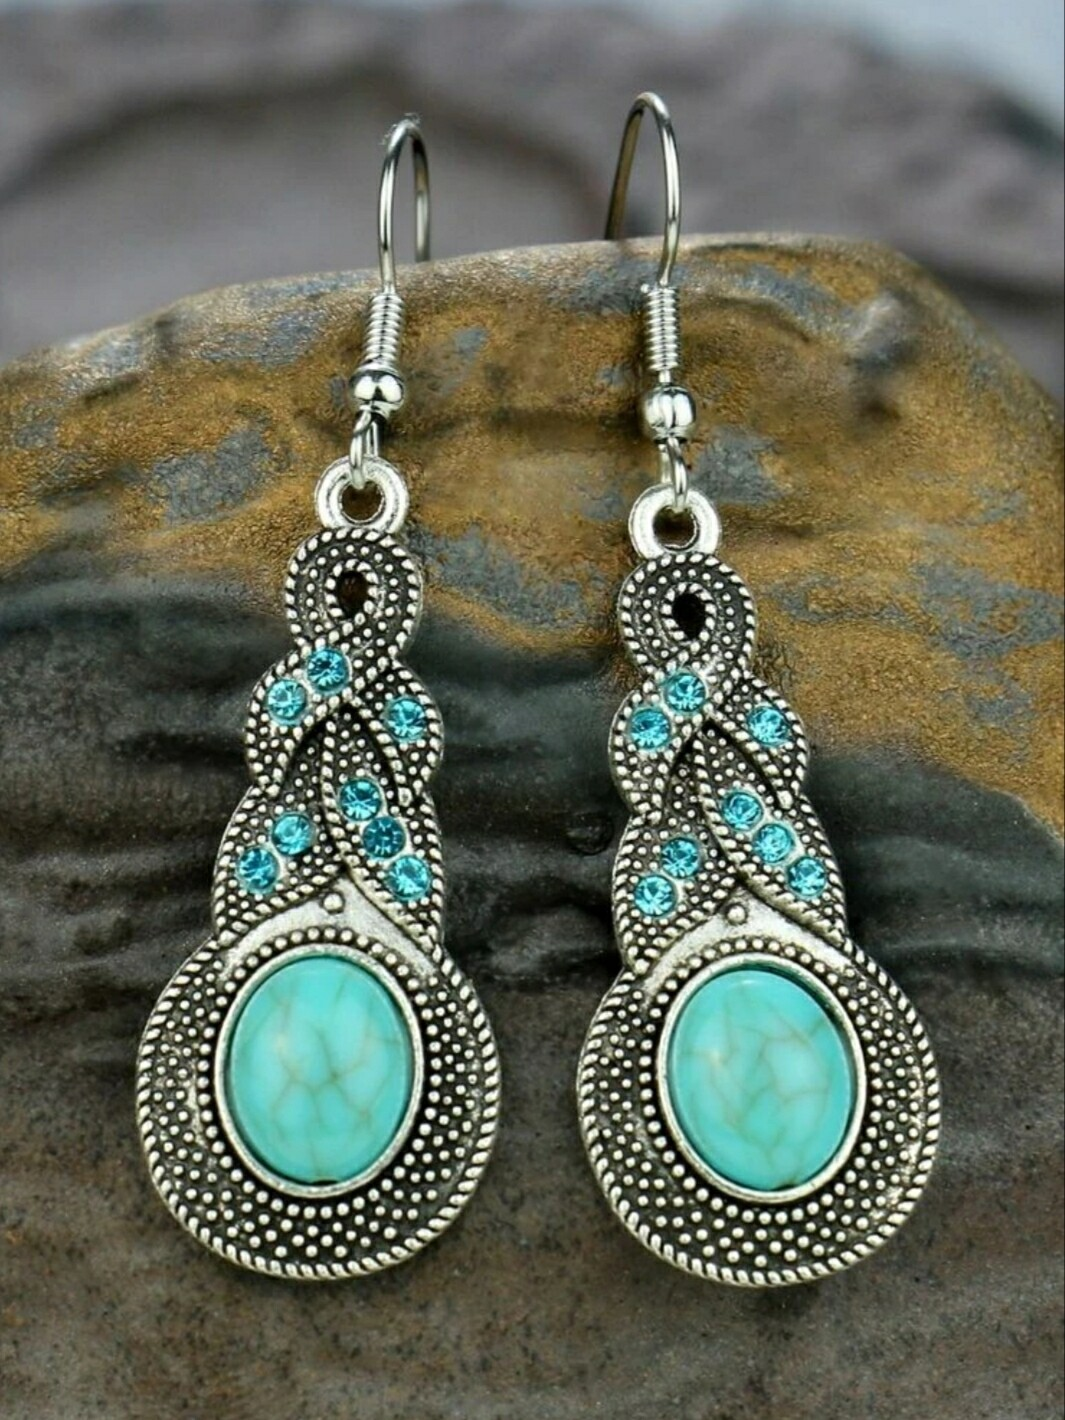 Rhinestone & Turquoise Drop Earrings